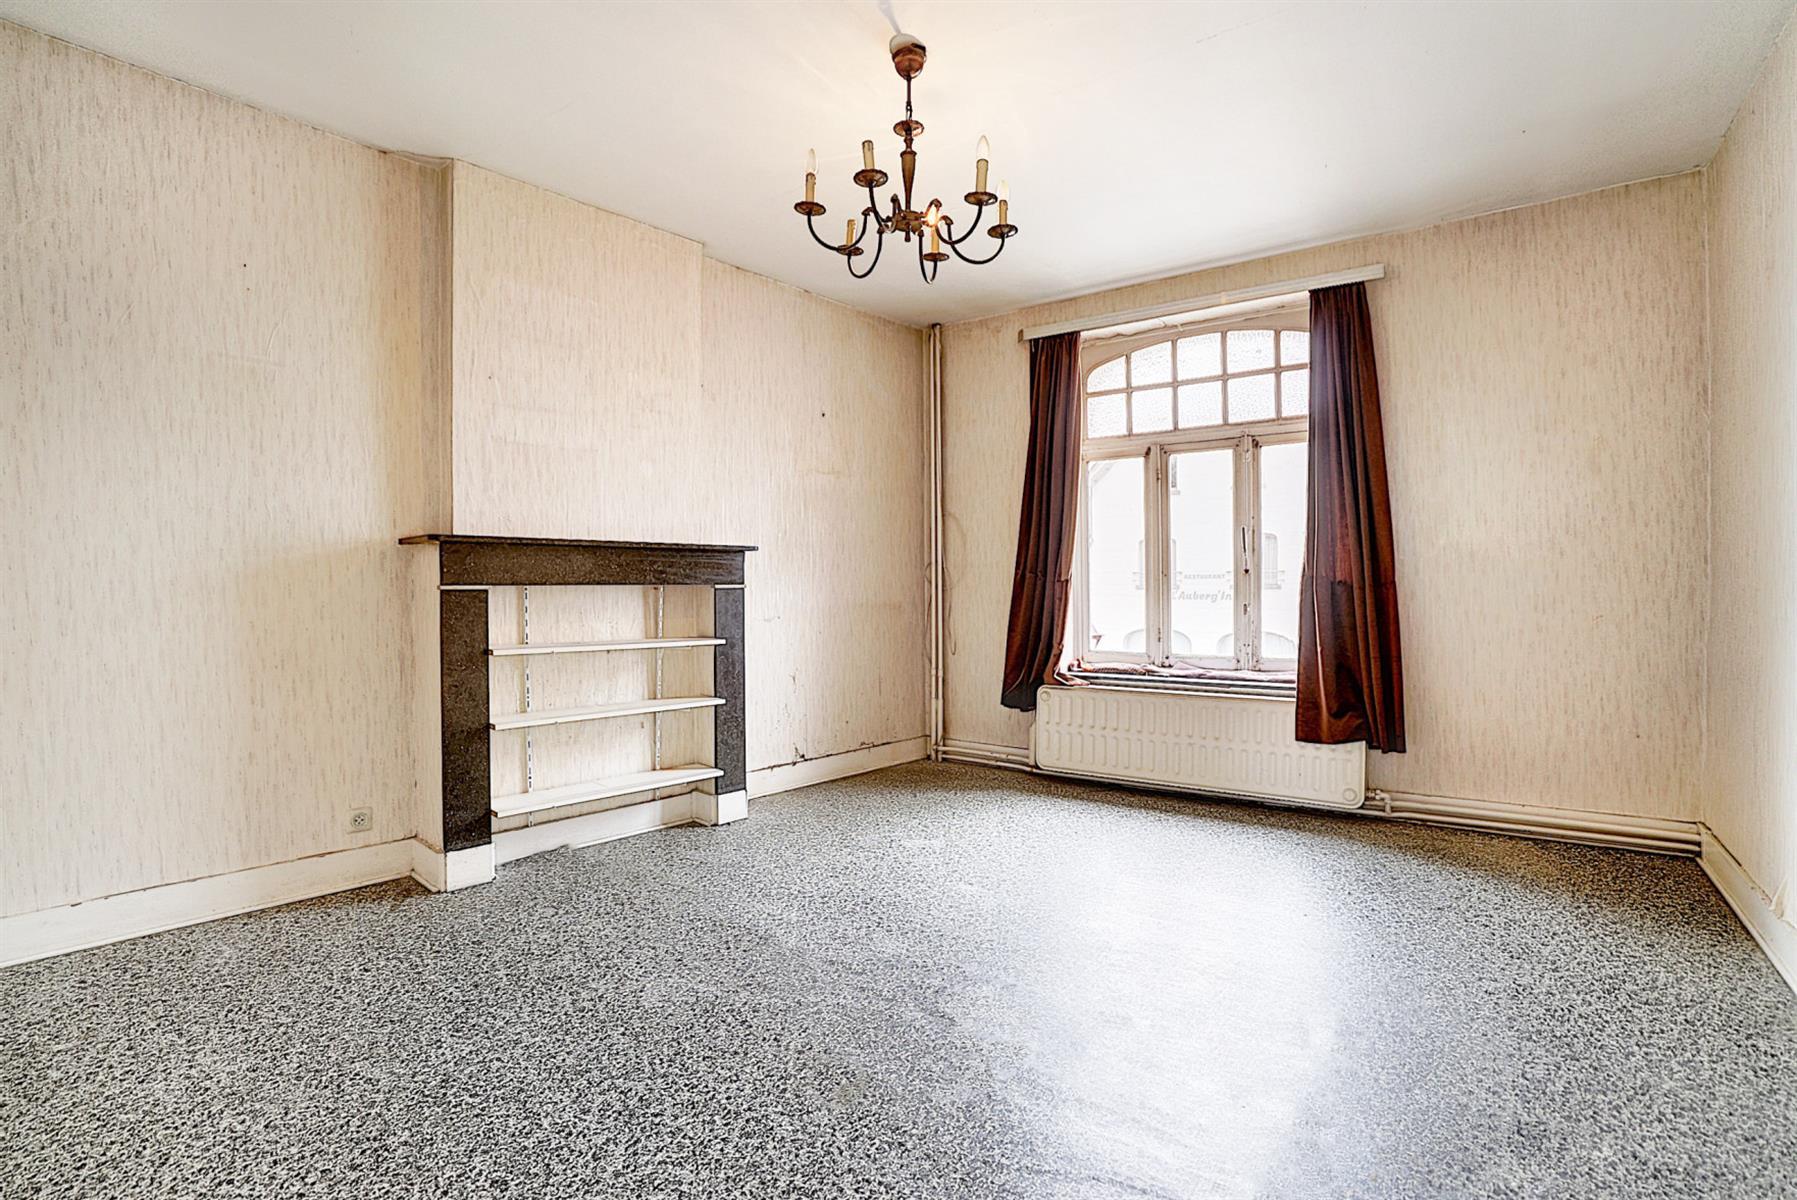 Maison - Ottignies-Louvain-la-Neuve - #4262981-12